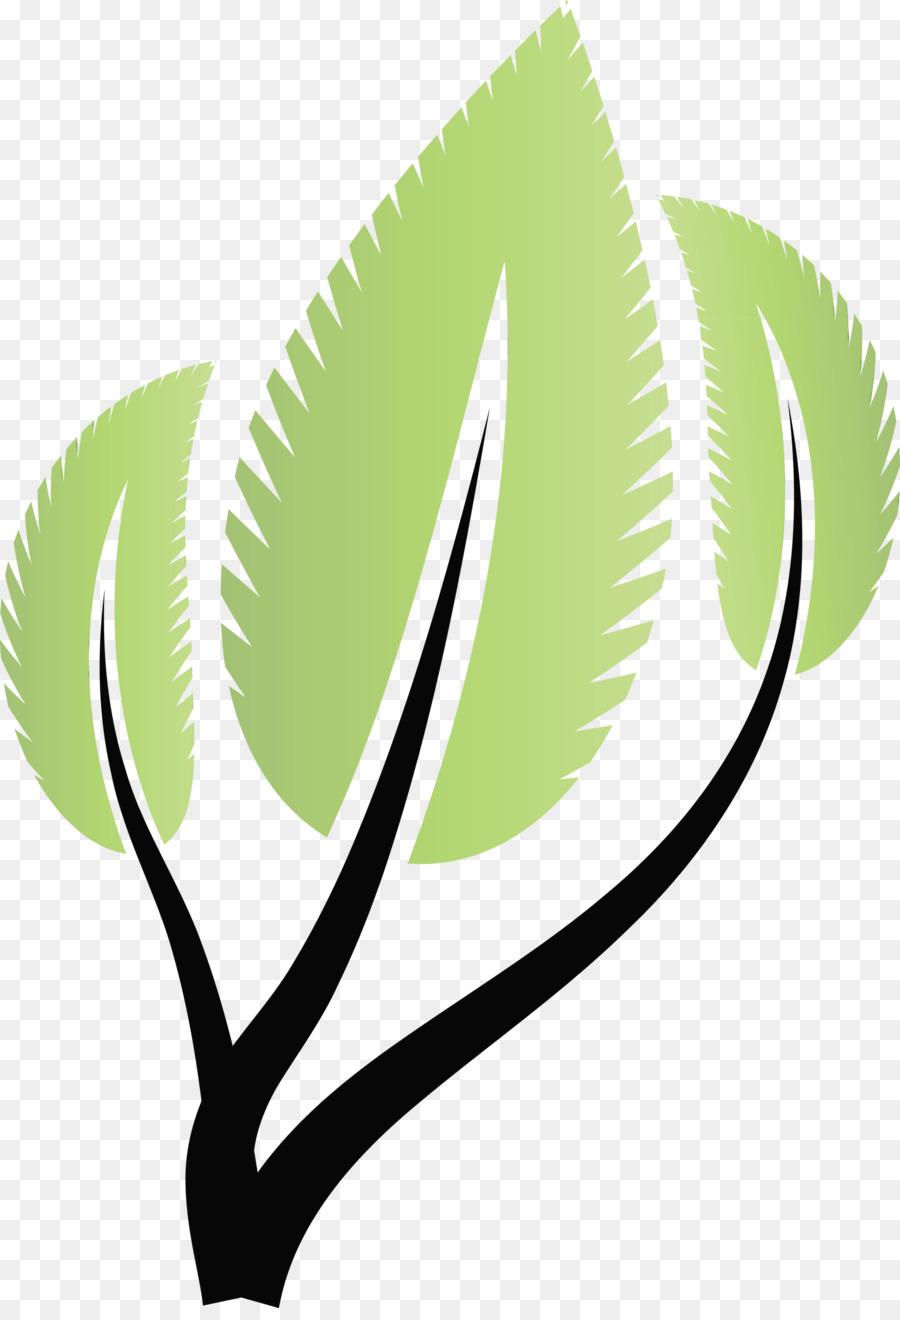 Descarga gratuita de Limonada, Té Verde, Bergamota De Naranja Imágen de Png